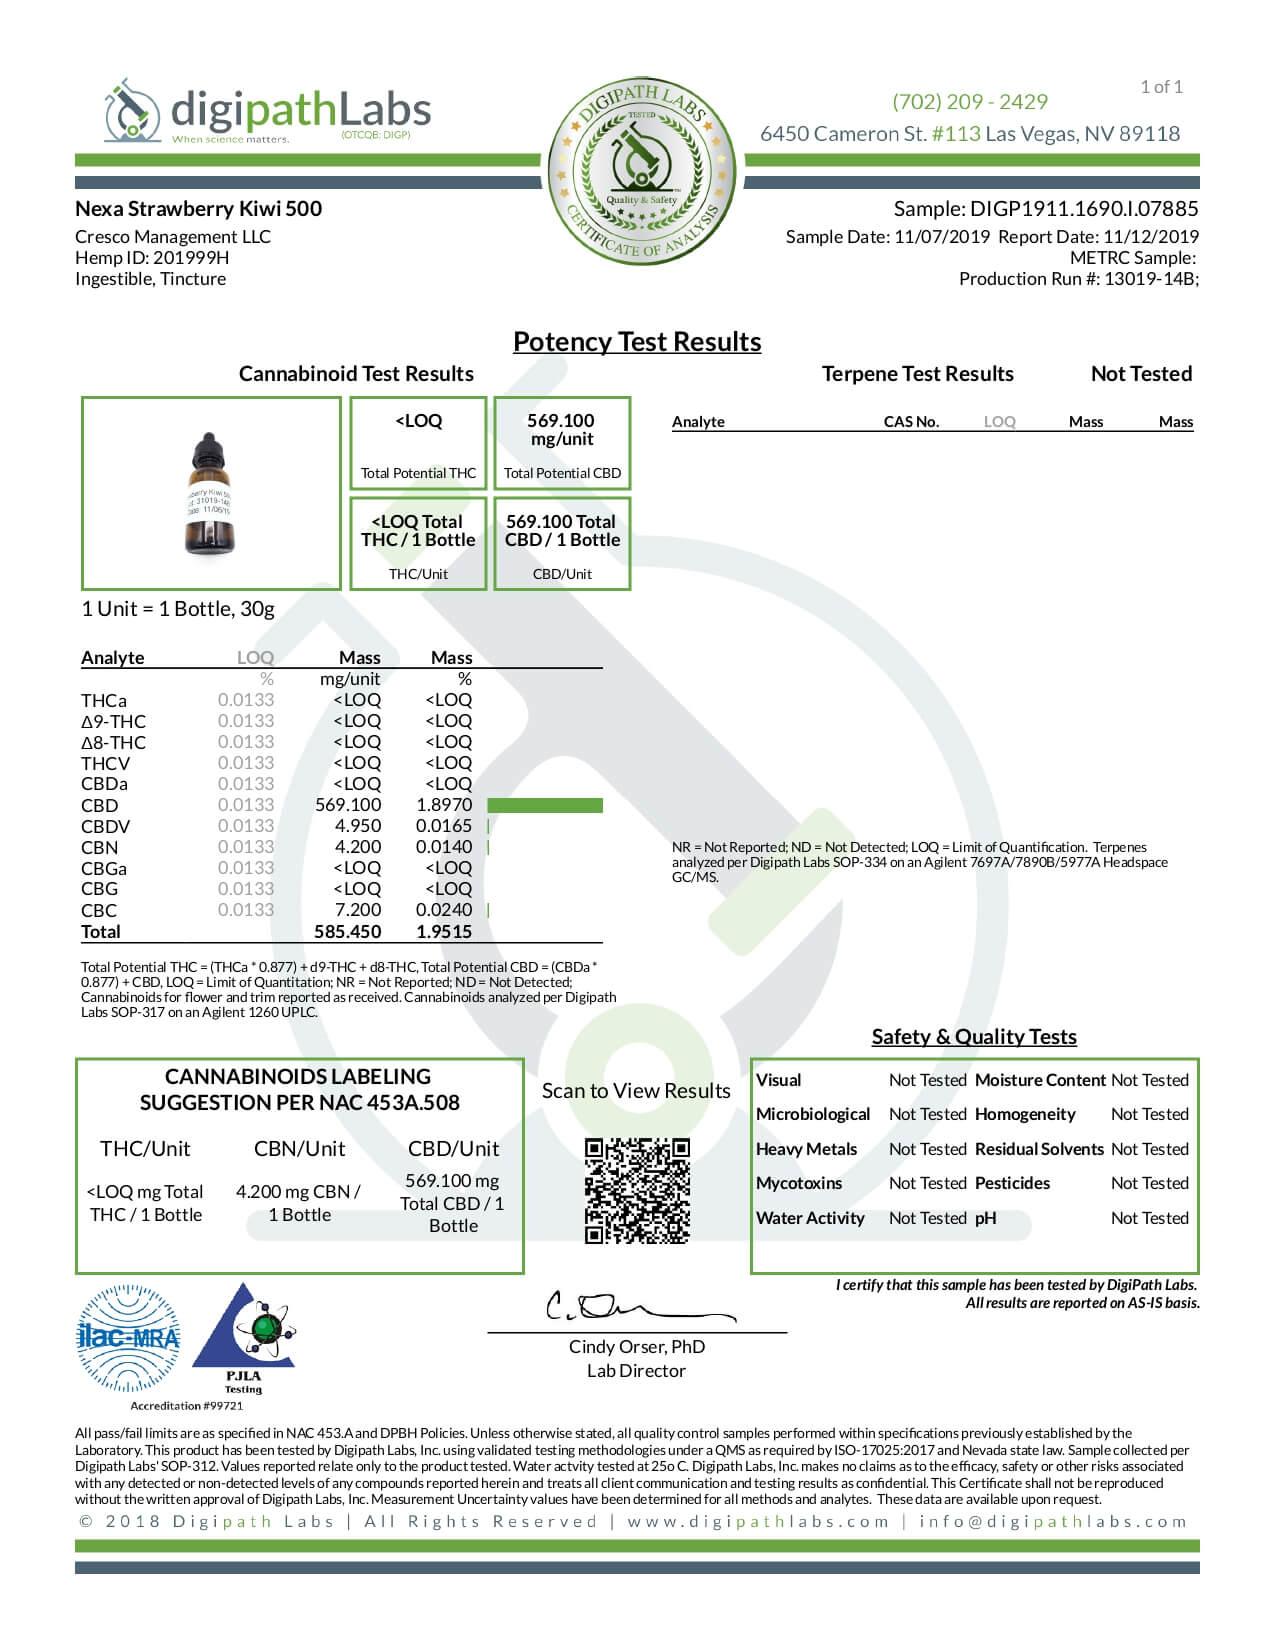 Nexa CBD Tincture Strawberry Kiwi 500mg Lab Report